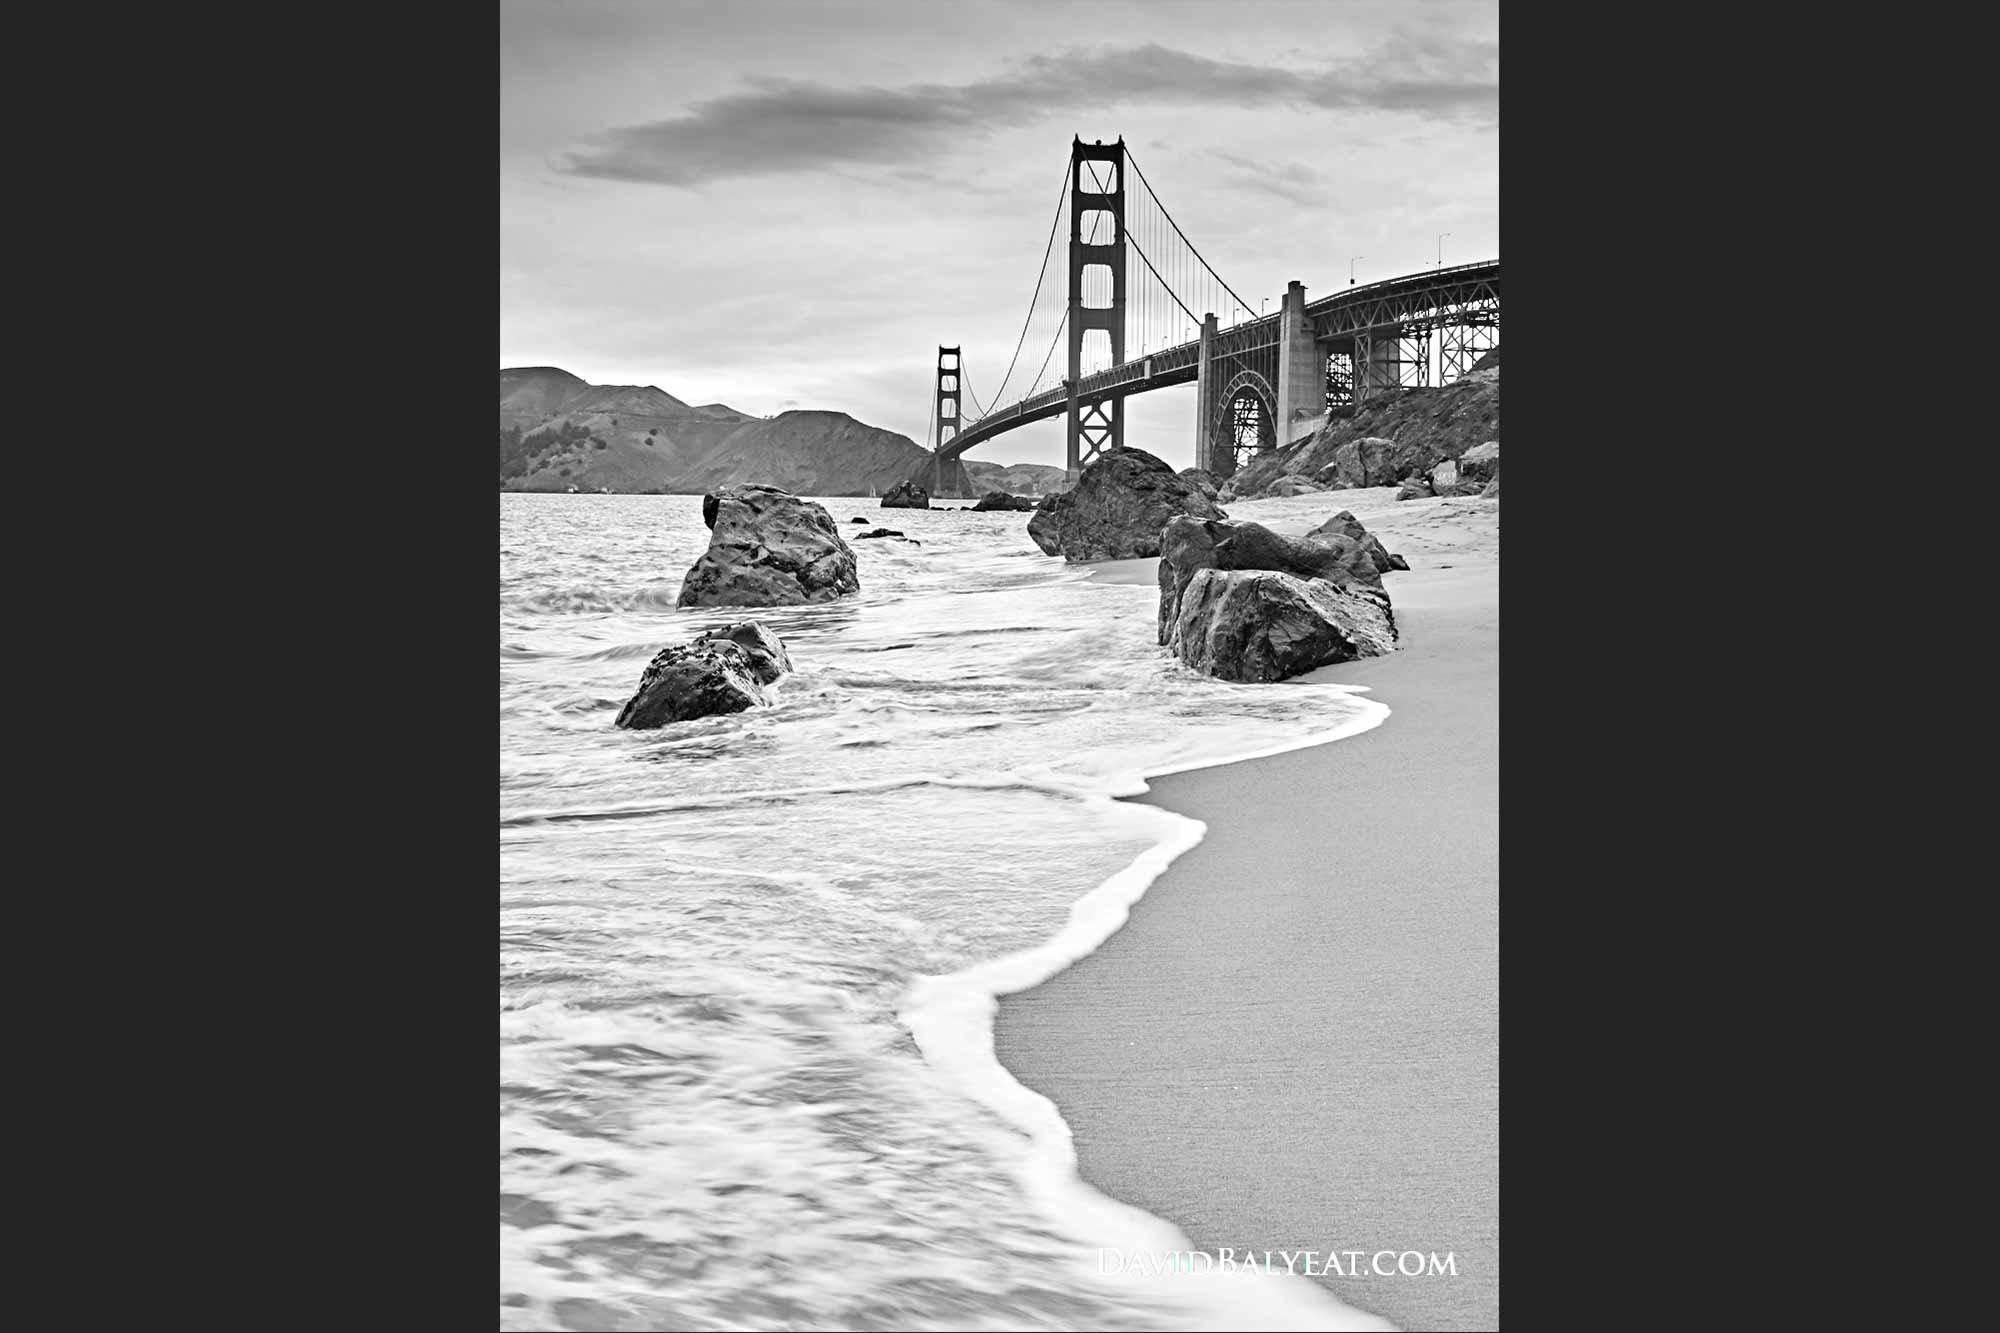 Golden Gate Bridge San Francisco Baker Beach high-definition HD professional landscape photography